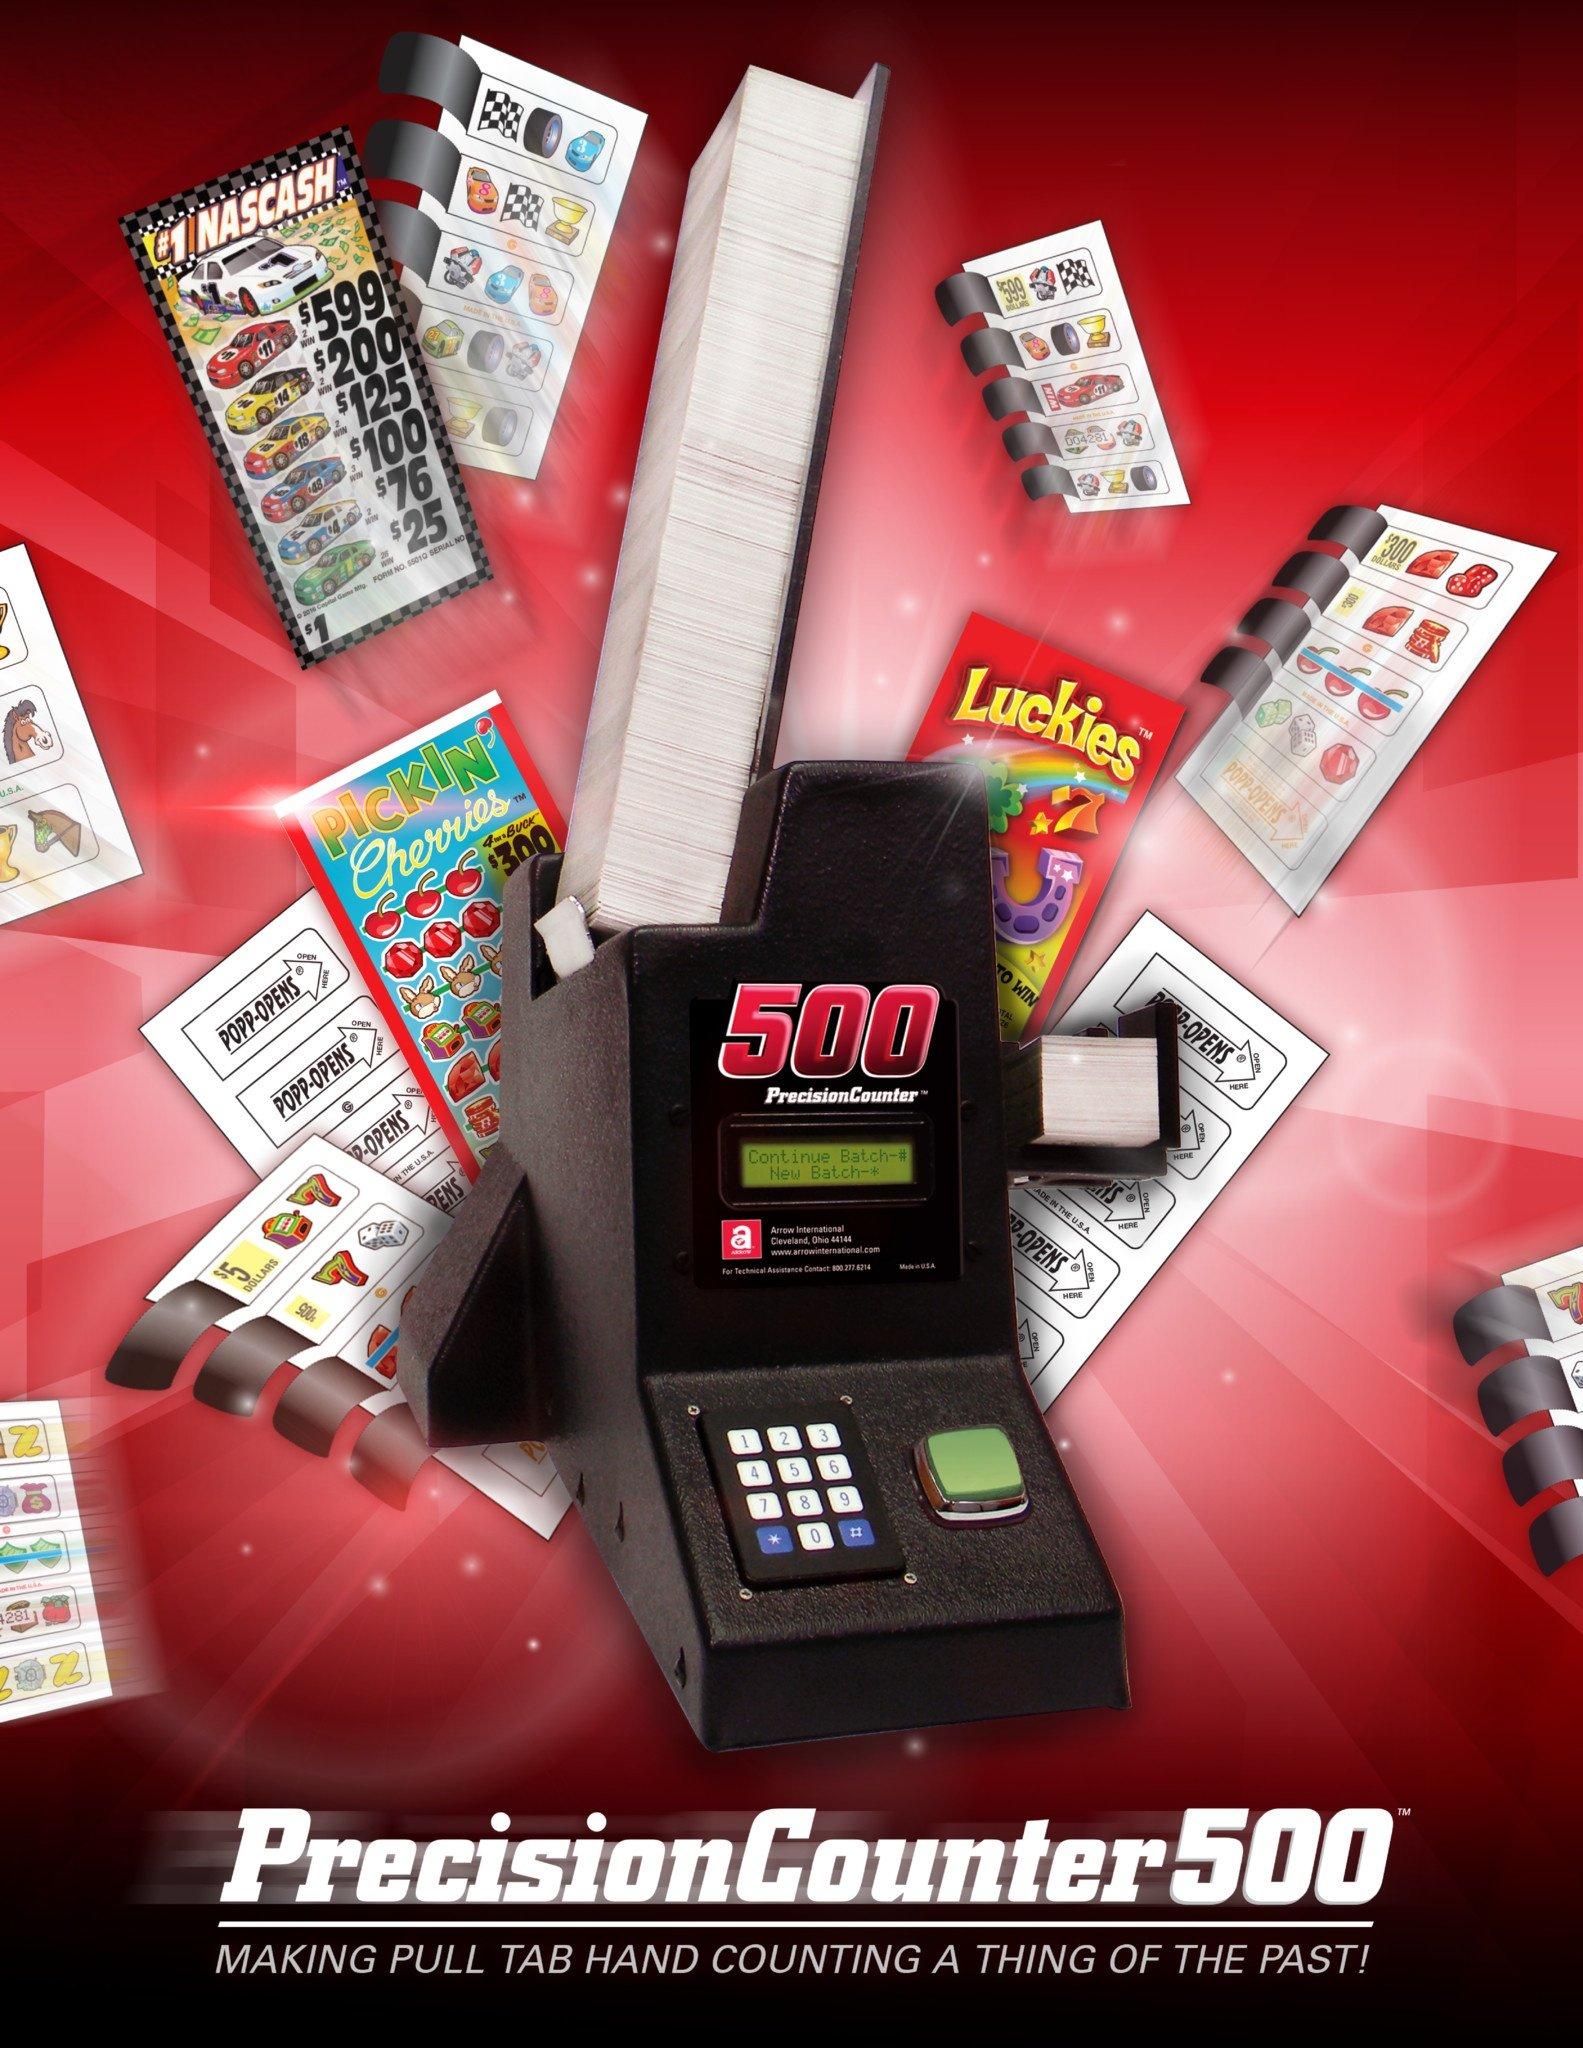 PrecisionCounter500 Brochure Promotional Materials/Equipment Flyers & Brochures